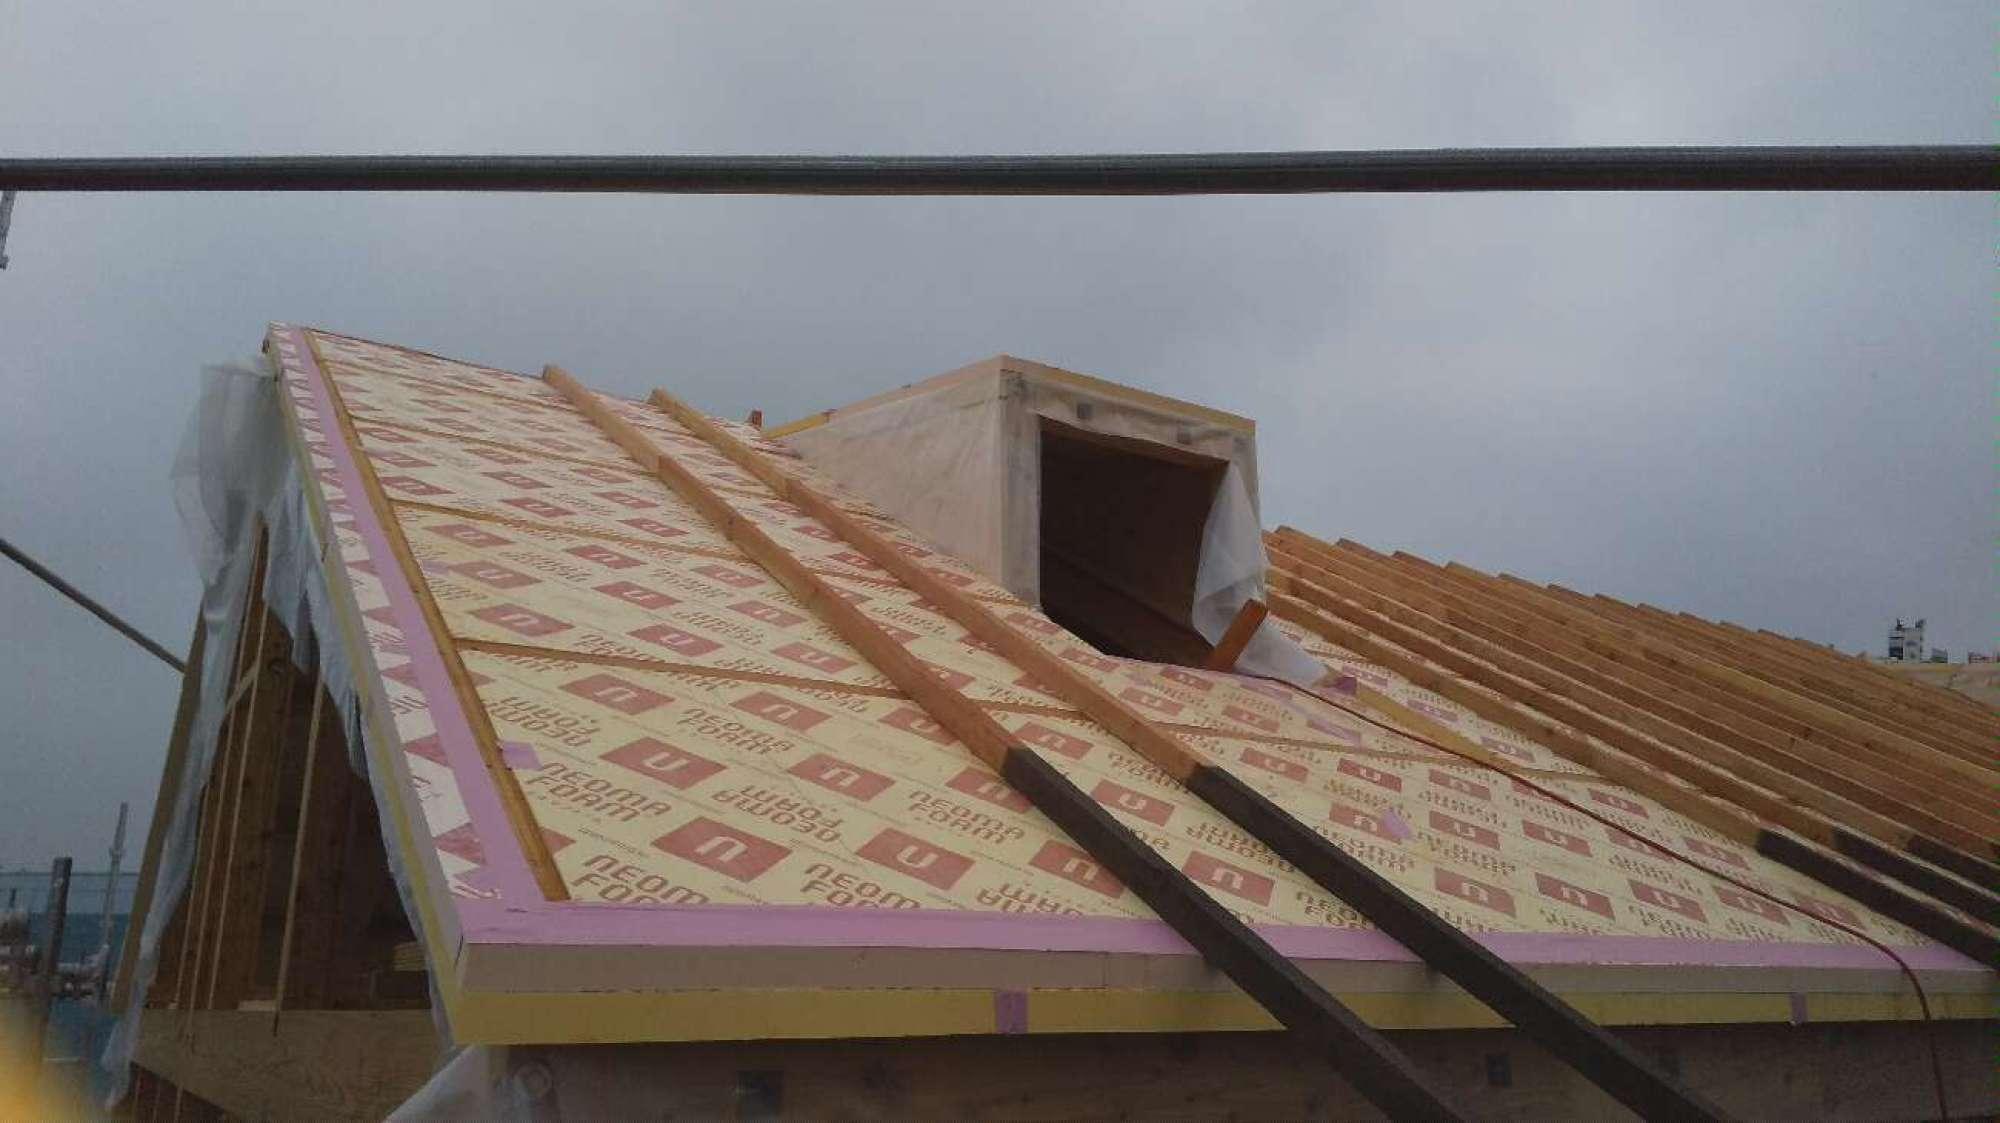 垂木掛け・天窓造作 -  -  -